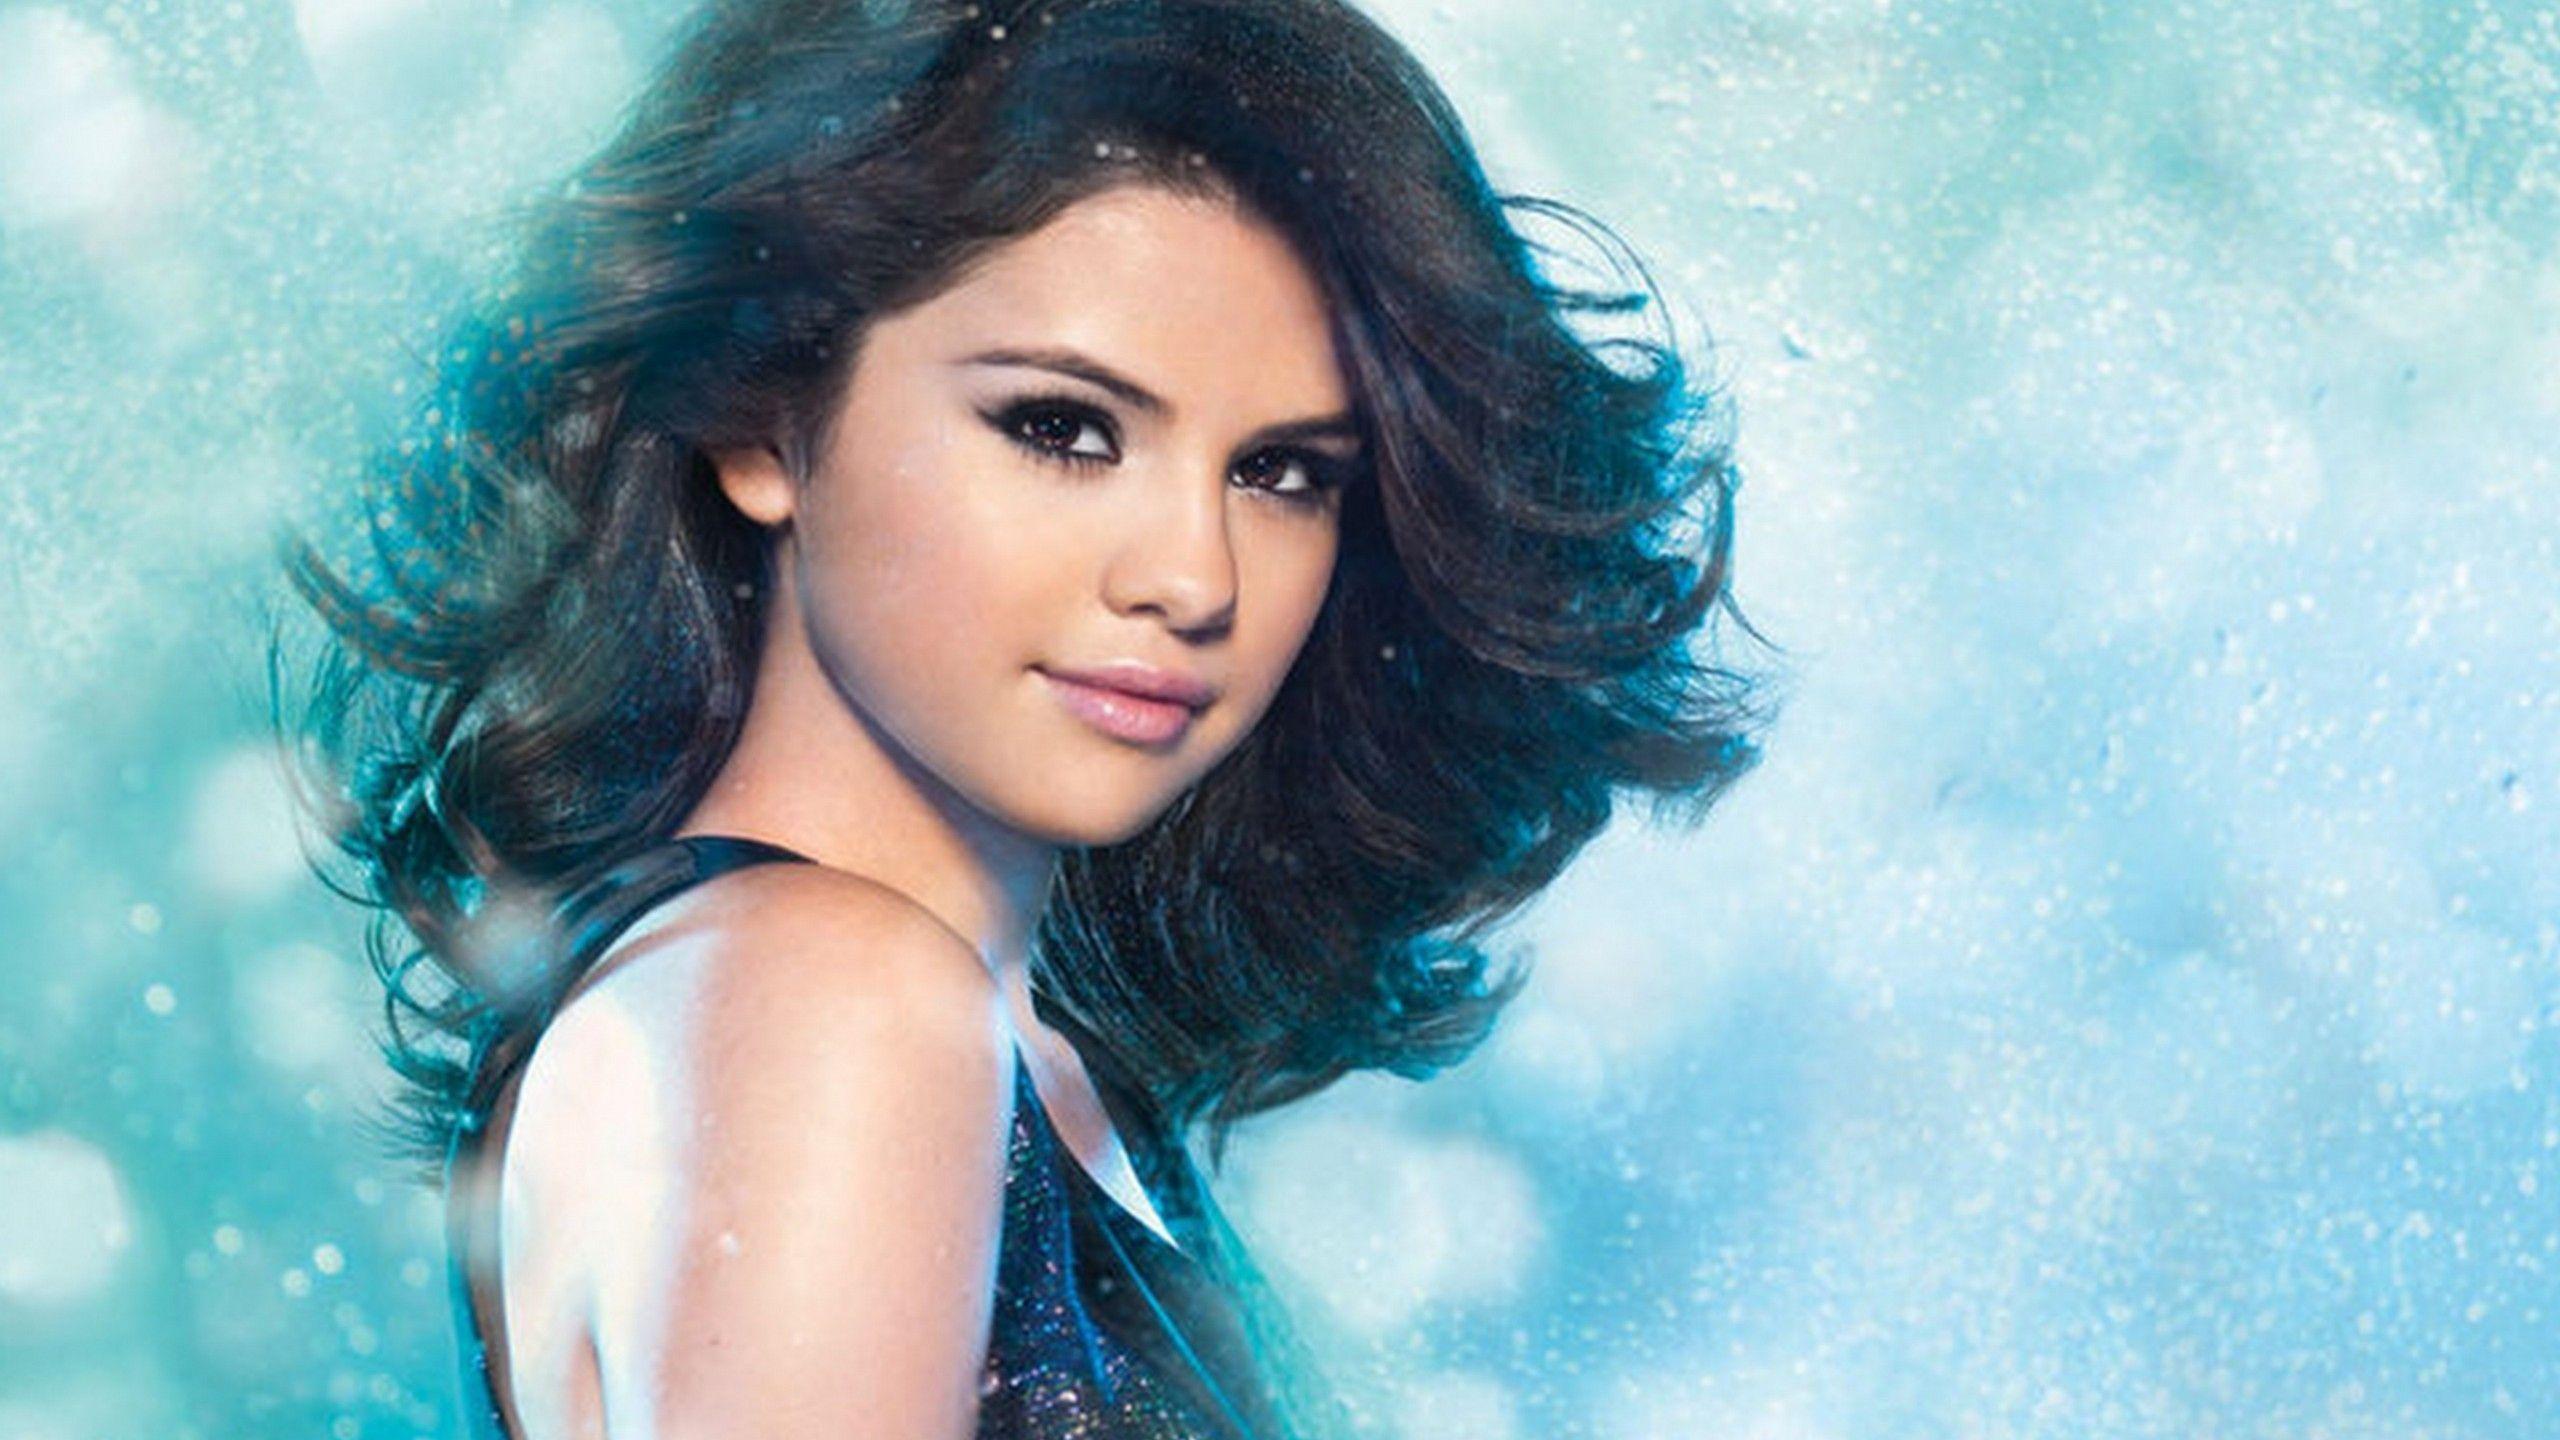 Image - Selena-Gomez-Wallpapers-selena-gomez-16407017-2560-1440 ...